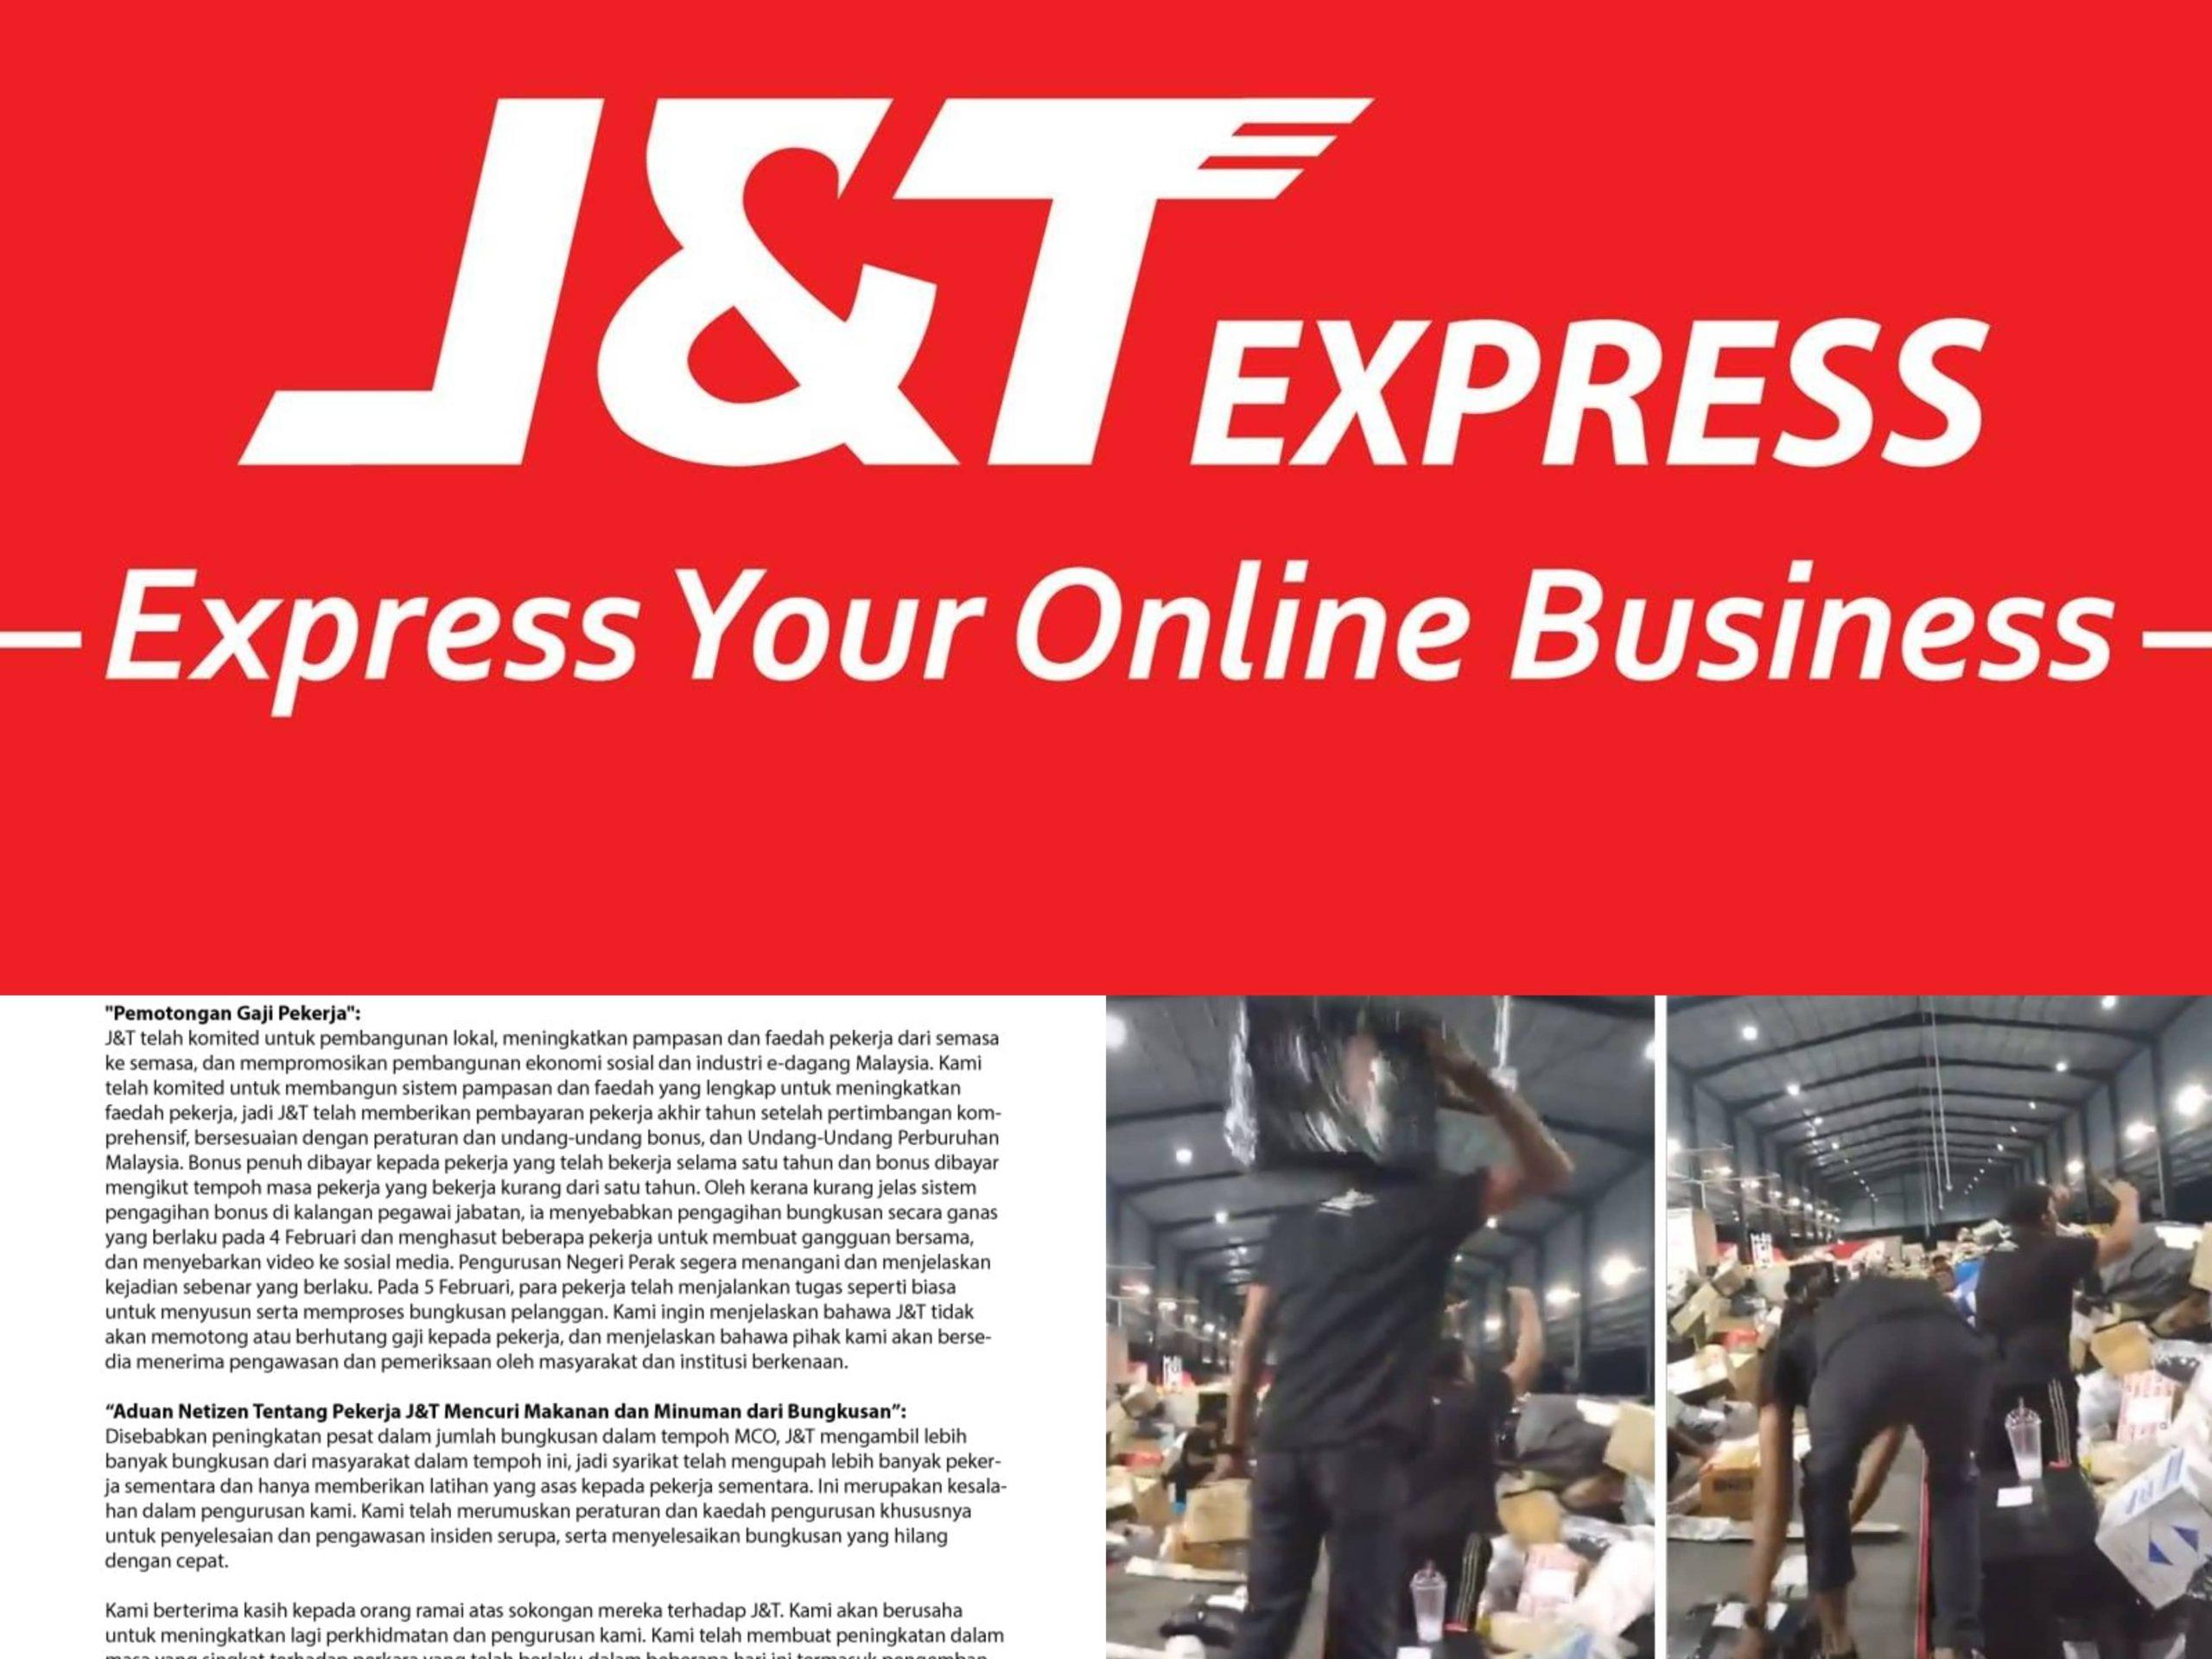 Pekerja J&T Mogok Dan Campak Barang Pengeposan Pelanggan